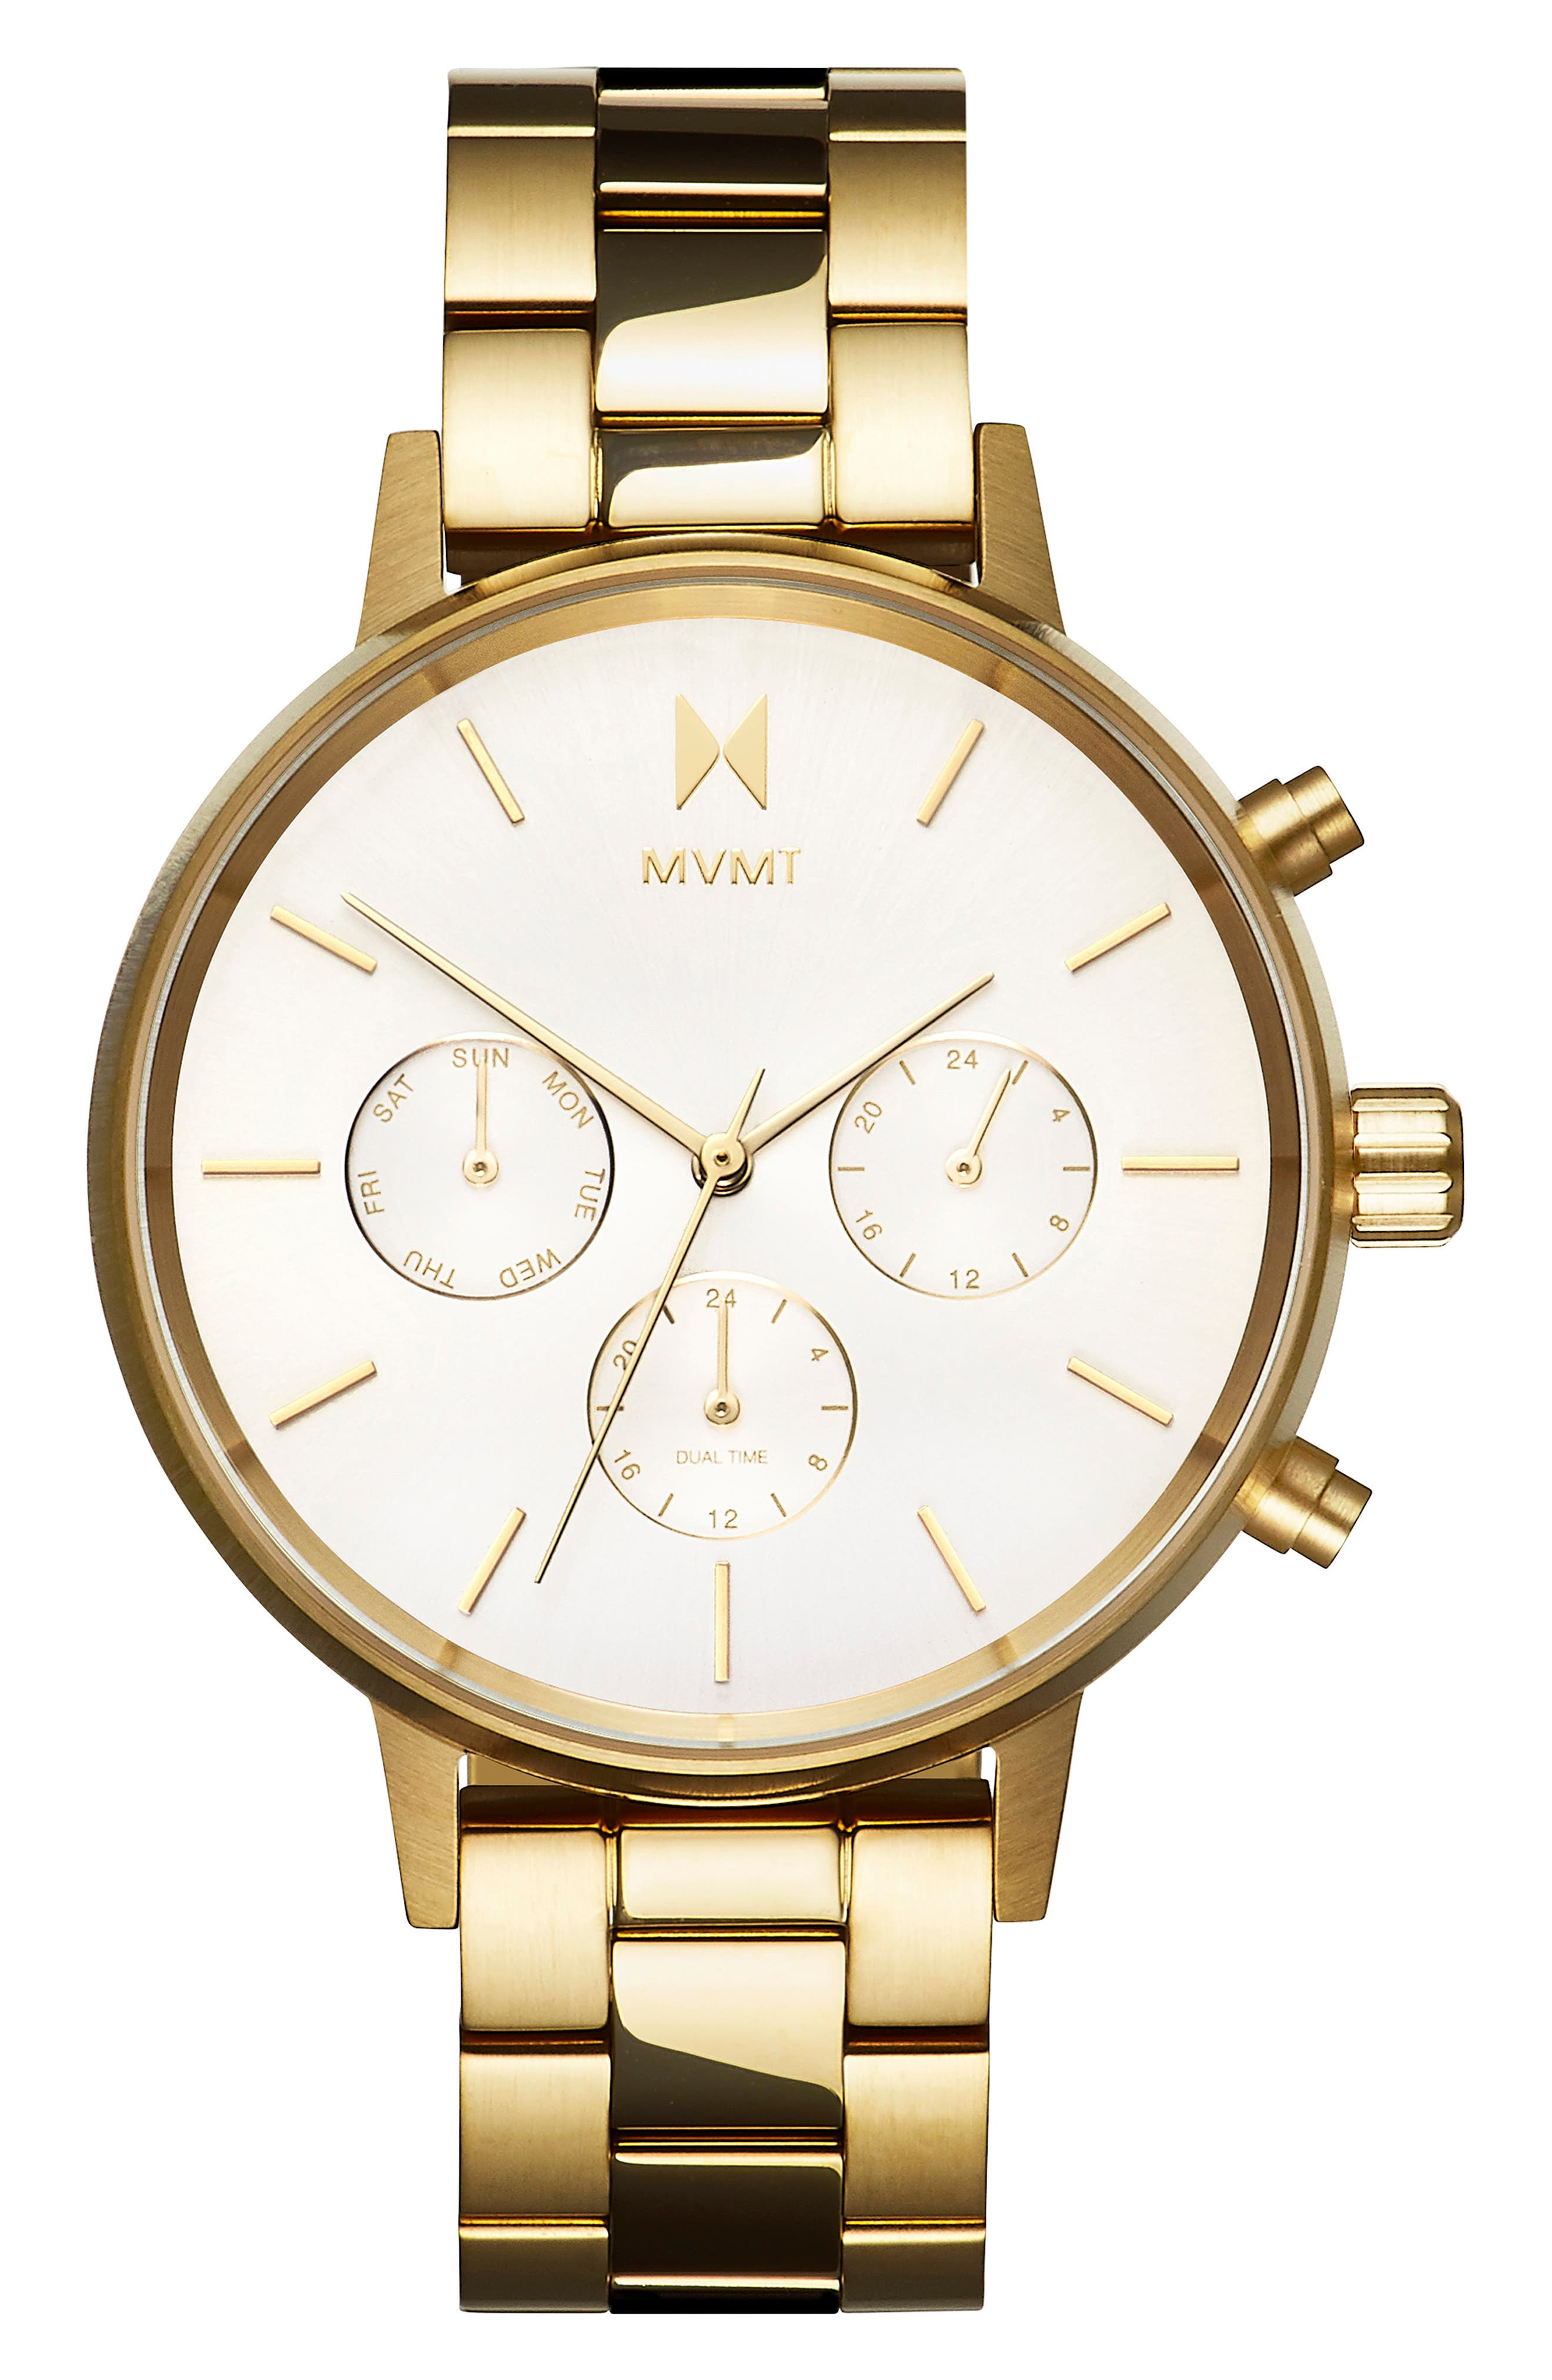 Nova Chronograph Bracelet Watch